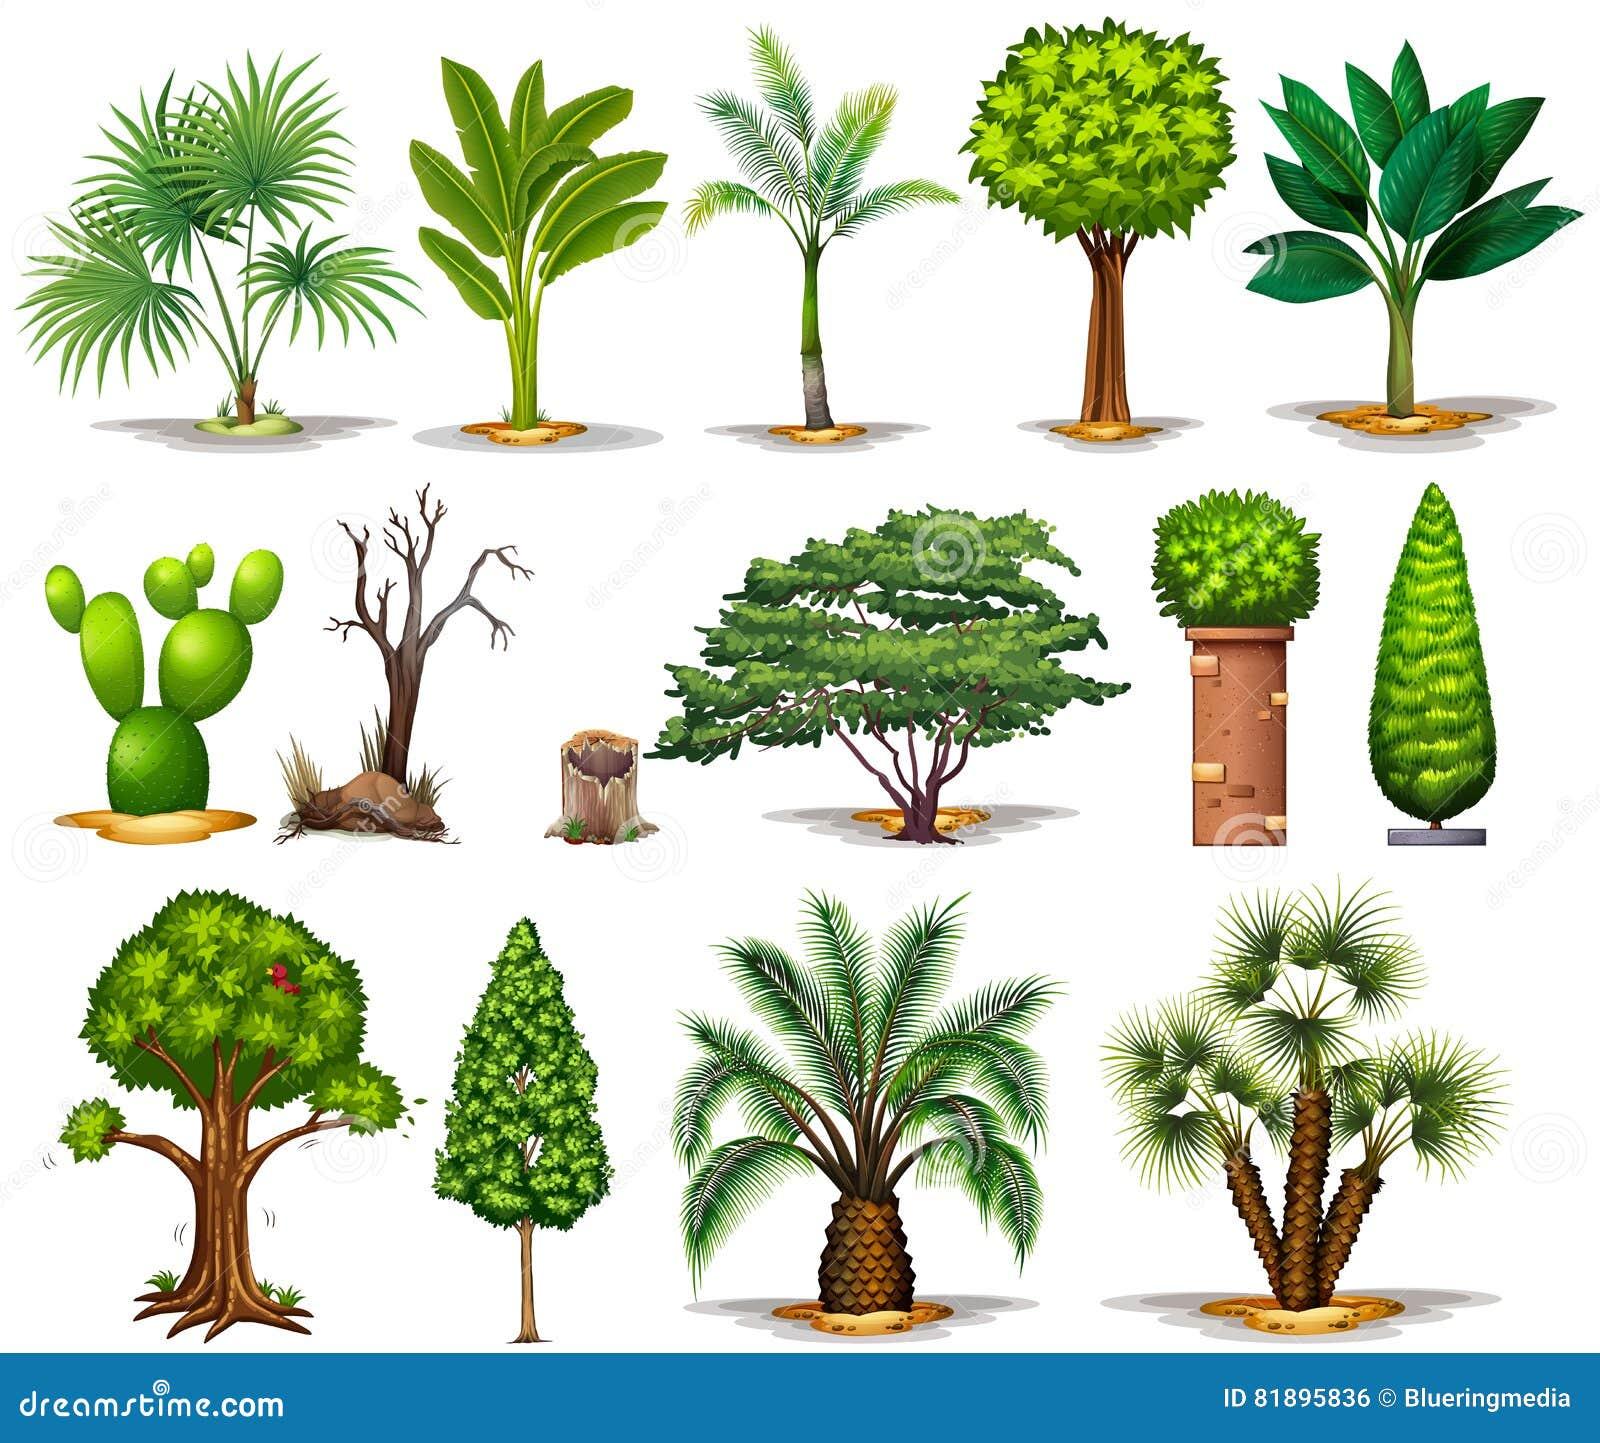 Diff rents types d 39 arbres illustration de vecteur image for Arboles con sus nombres y caracteristicas